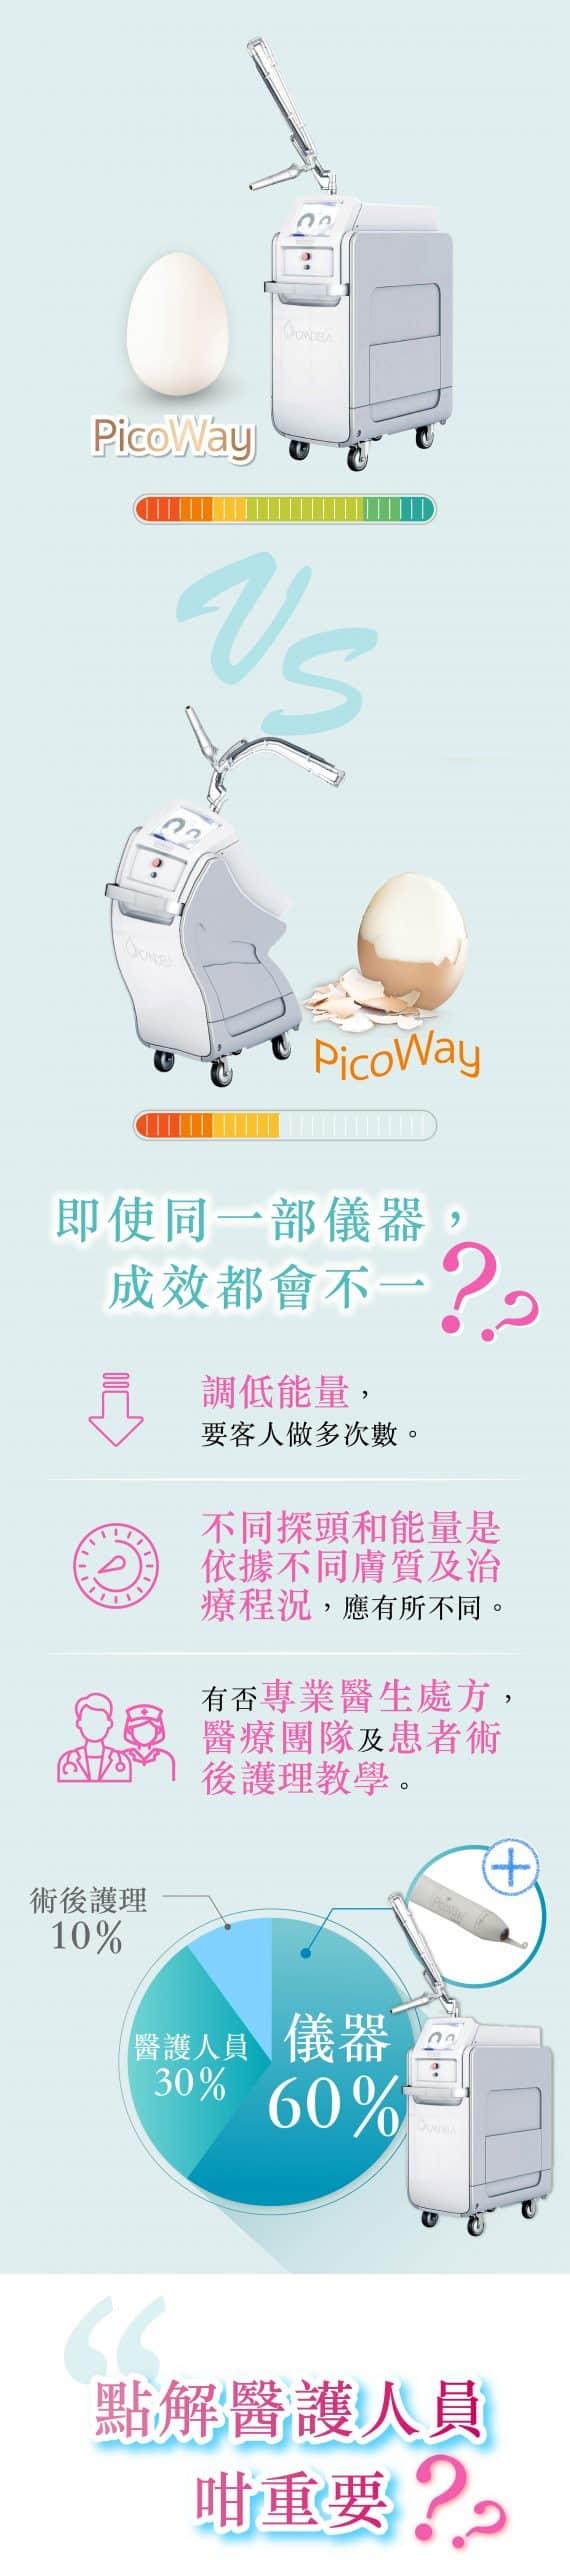 picoway_n02 pico new version b 27 scaled